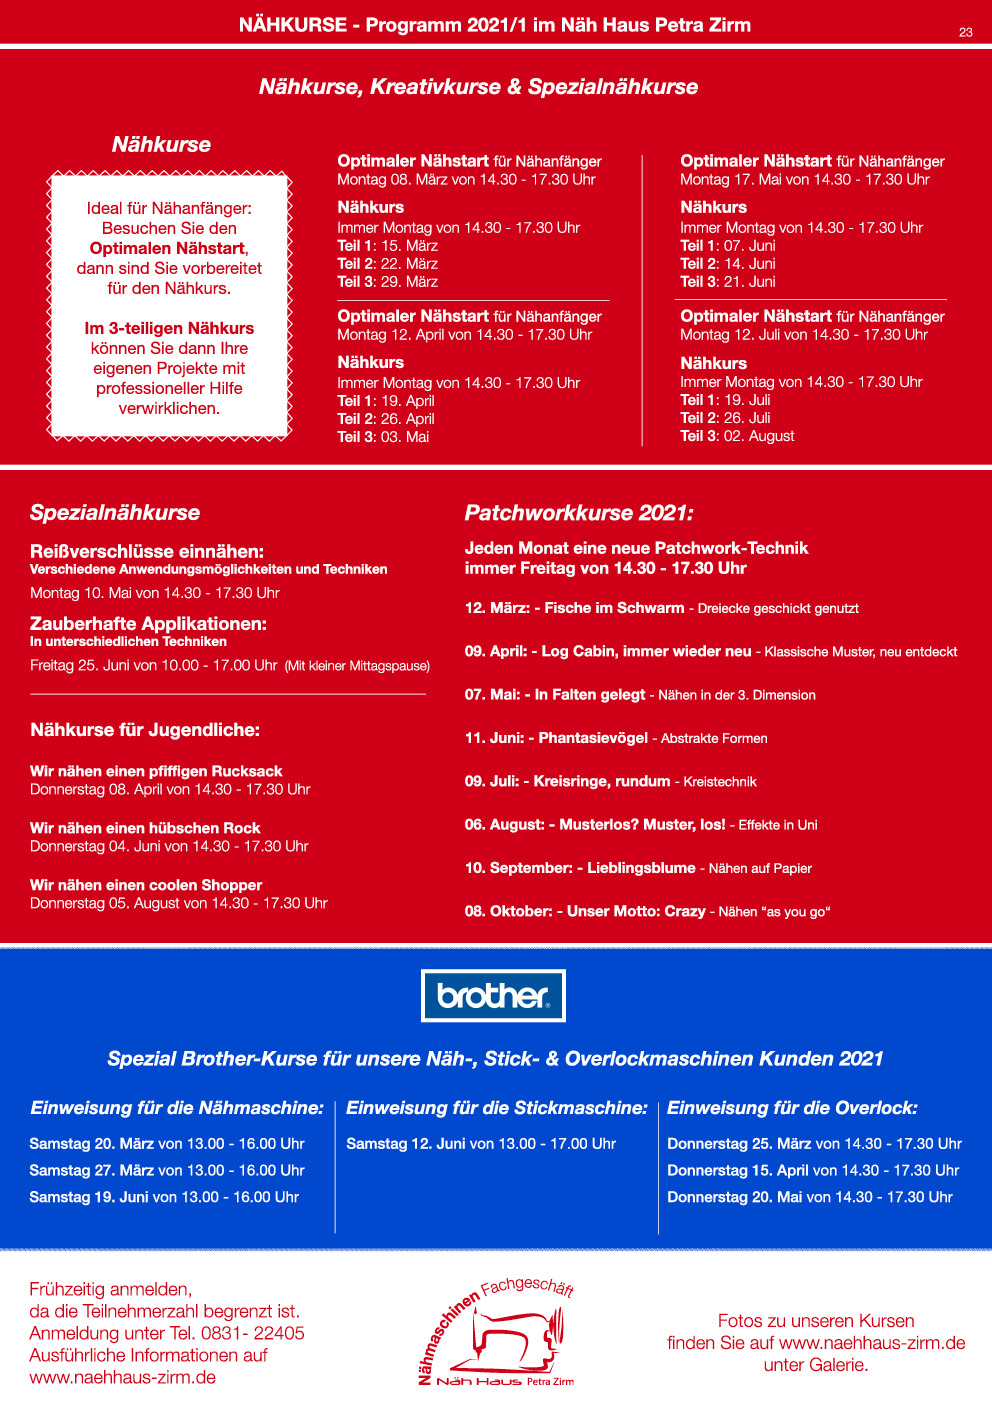 Naehkurse-Zirm-2021-1